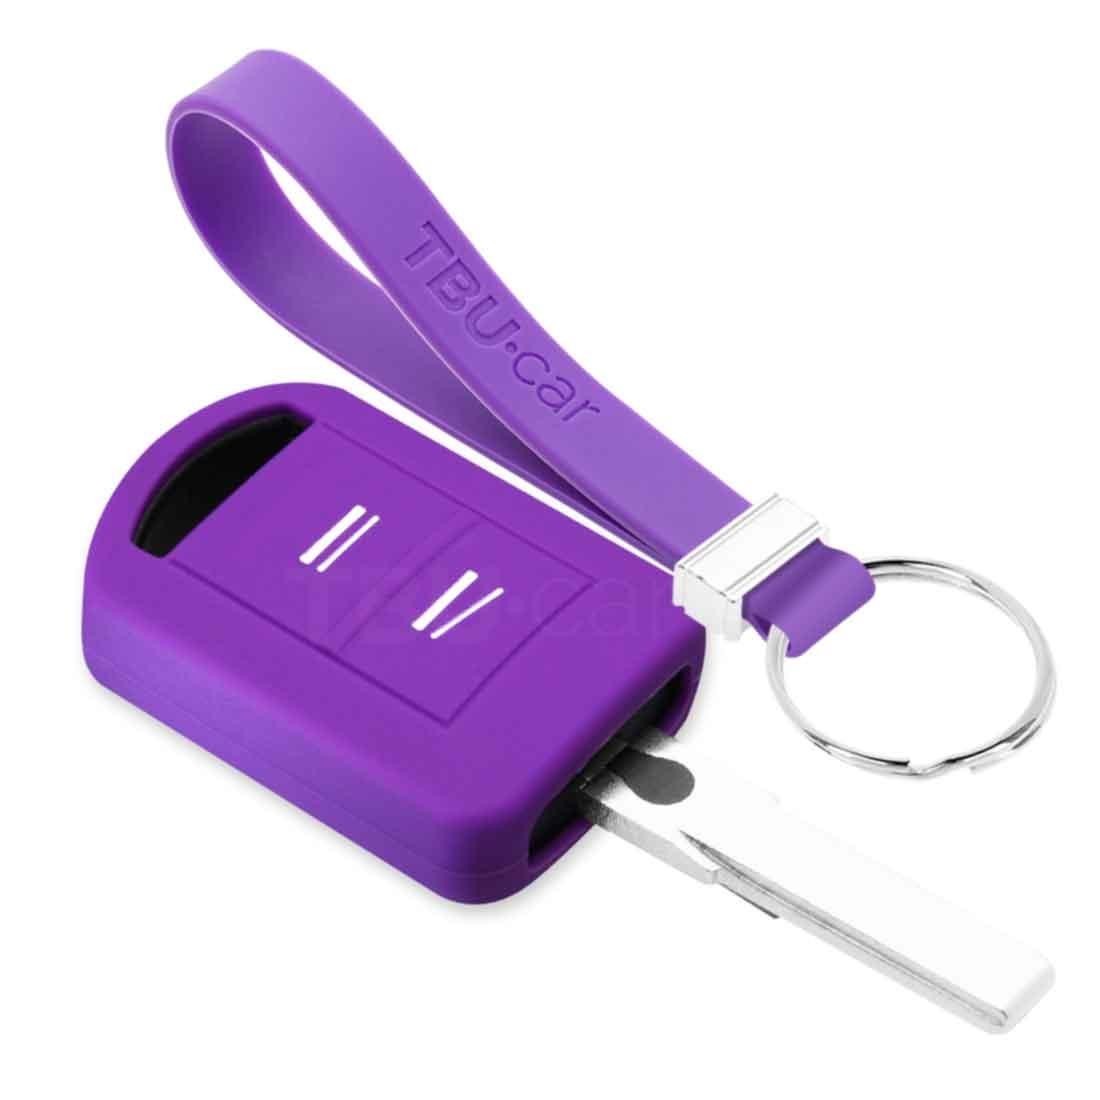 TBU car TBU car Autoschlüssel Hülle kompatibel mit Opel 2 Tasten - Schutzhülle aus Silikon - Auto Schlüsselhülle Cover in Violett